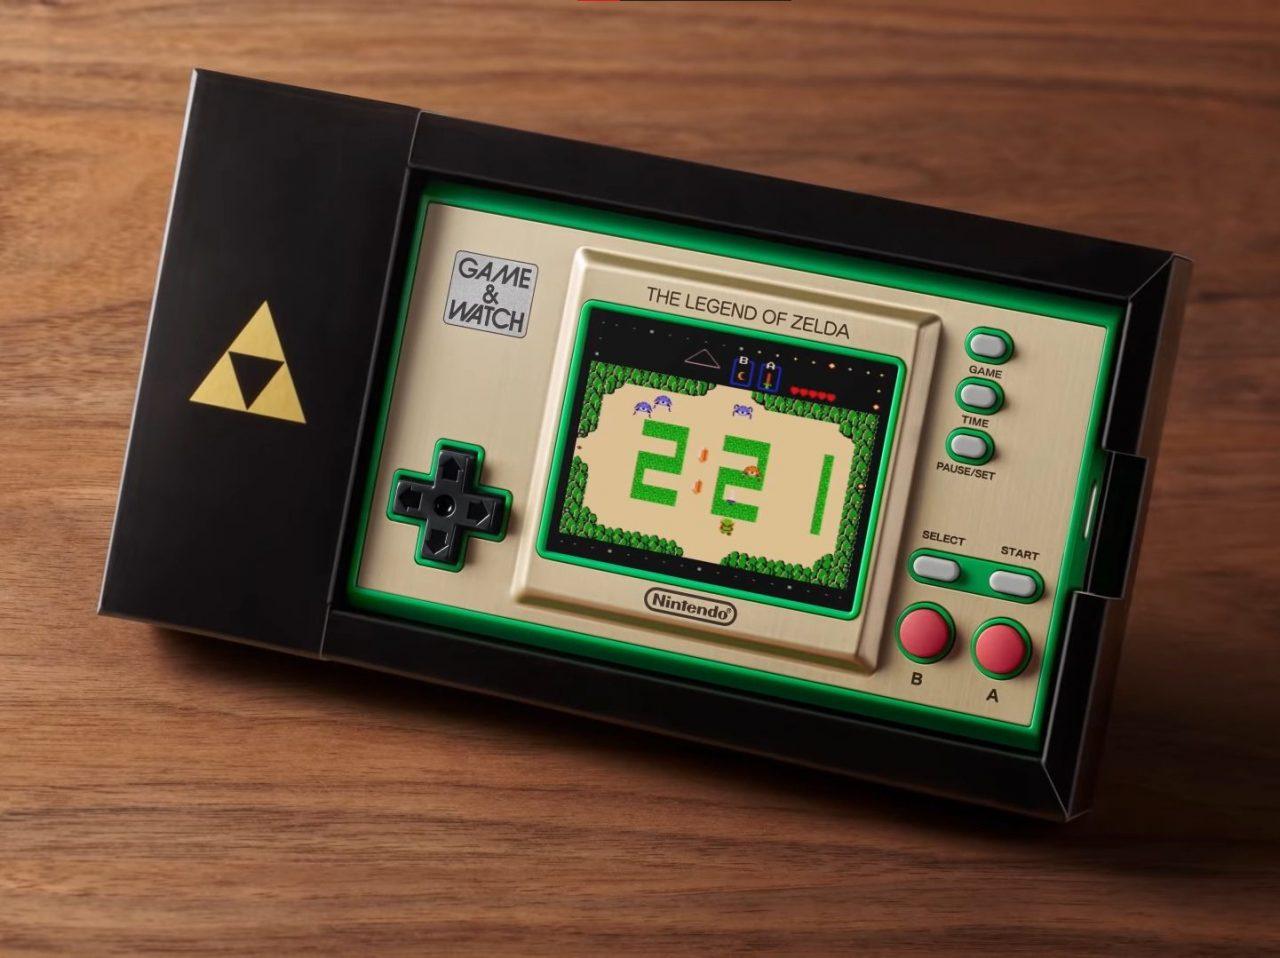 La nouvelle Game & Watch de Nintendo